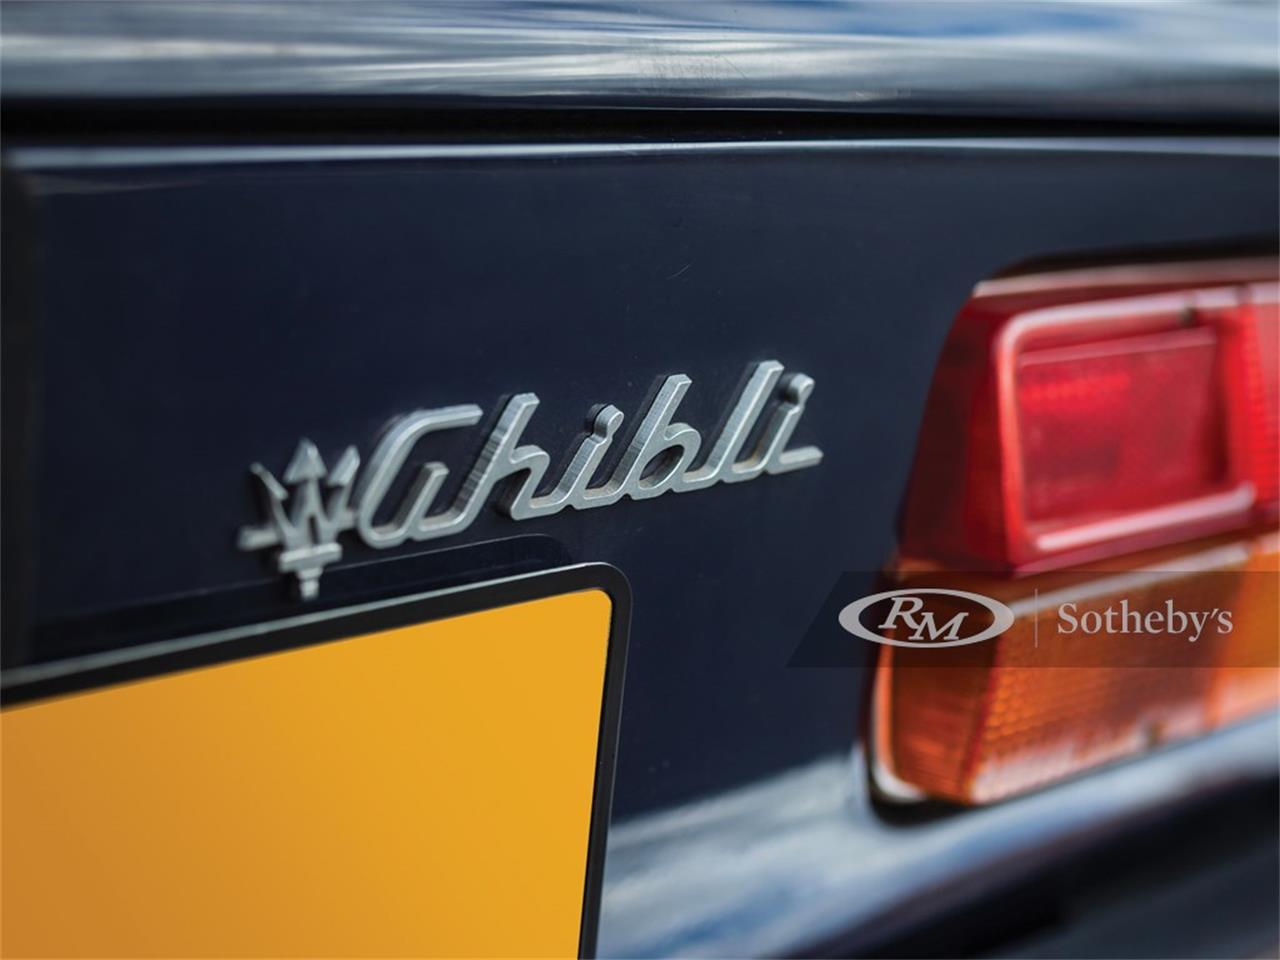 1970 Maserati Ghibli (CC-1330381) for sale in Essen, Germany